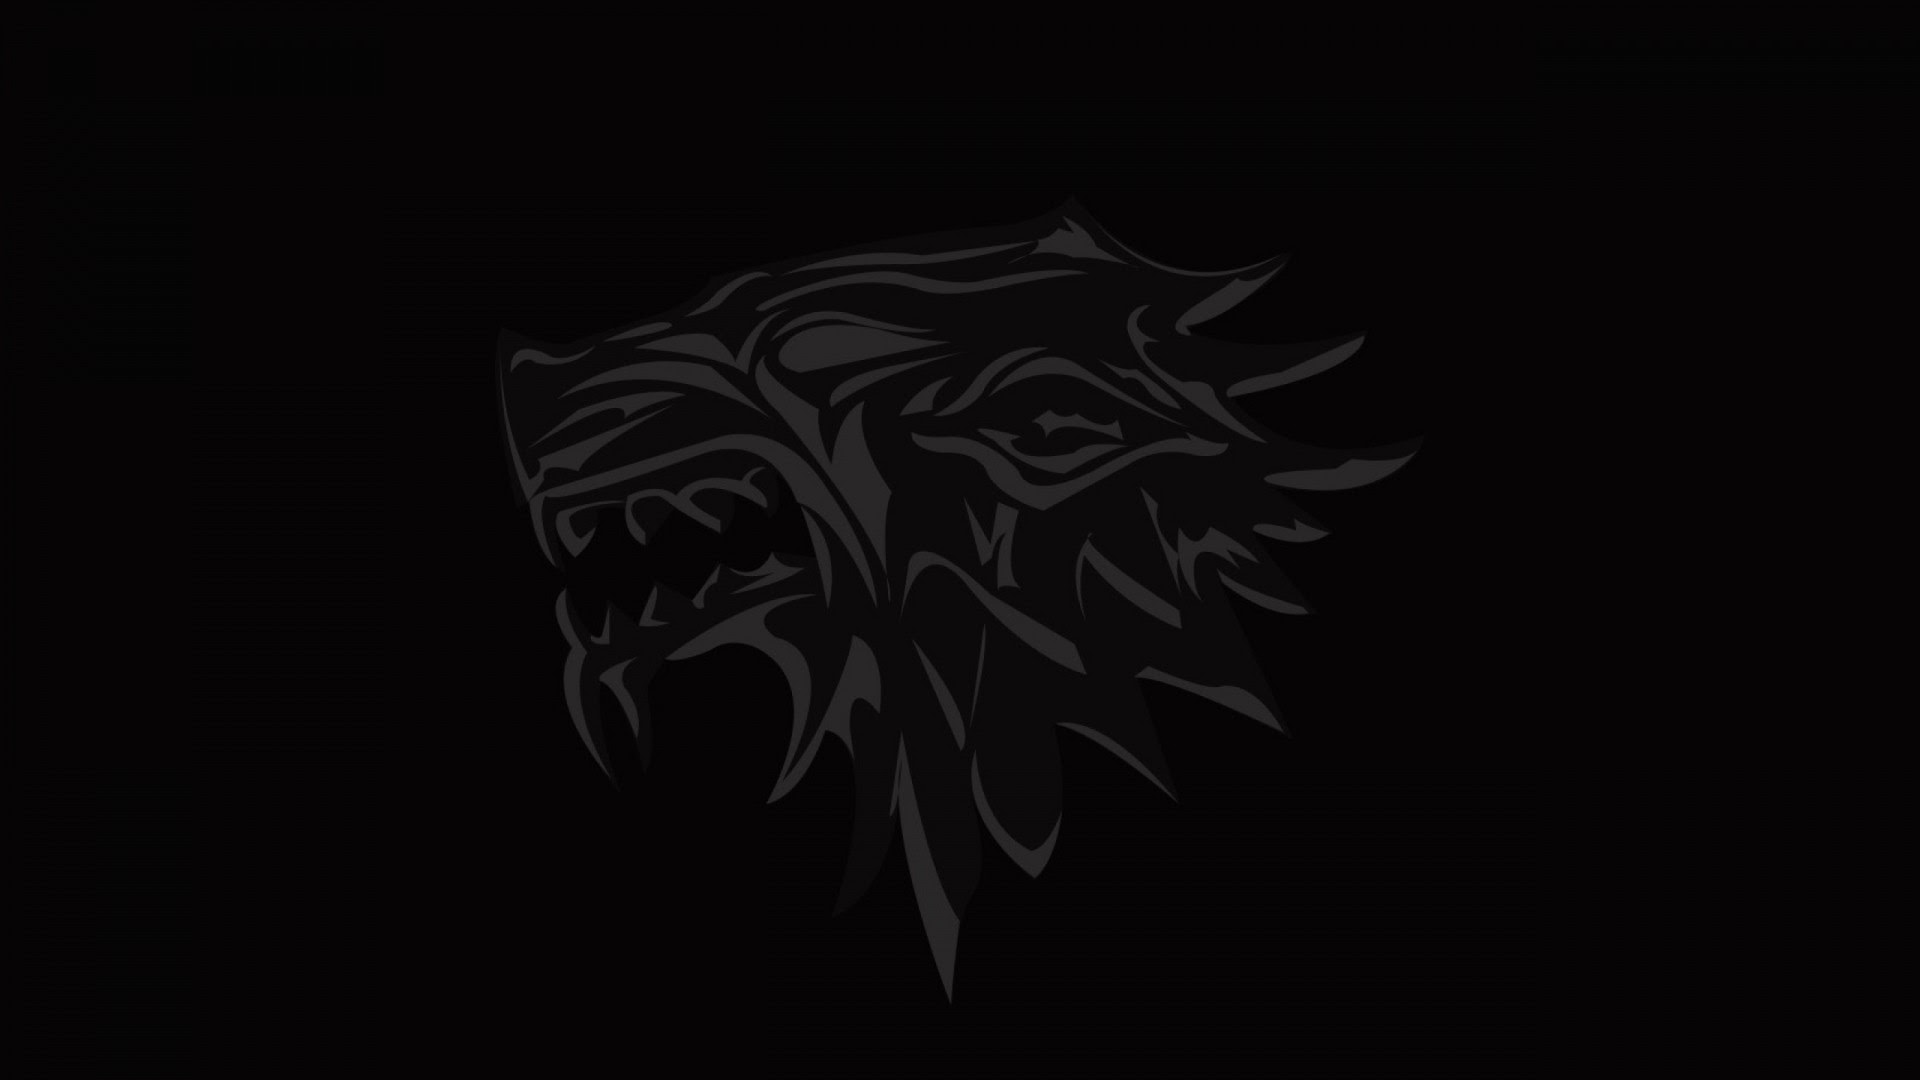 Download 78 Background Black Wallpaper HD Gratis